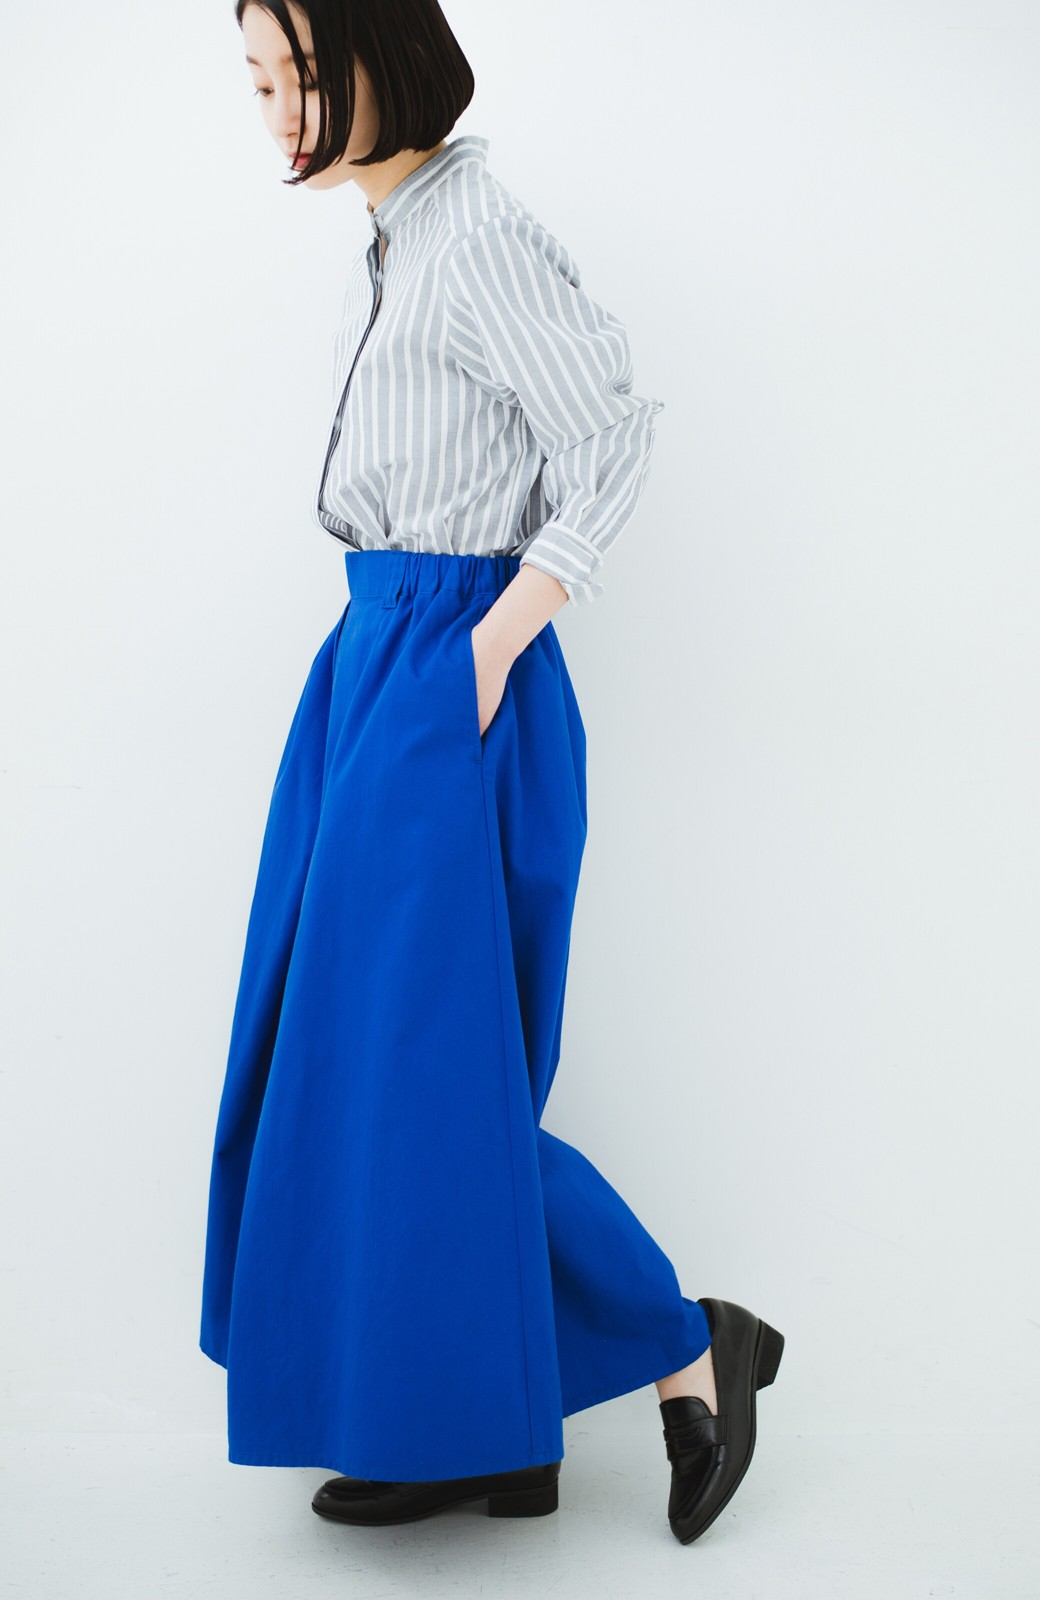 haco! 【今年も再販!】ロングシーズン楽しめる タックボリュームのチノロングスカート <ブルー>の商品写真19